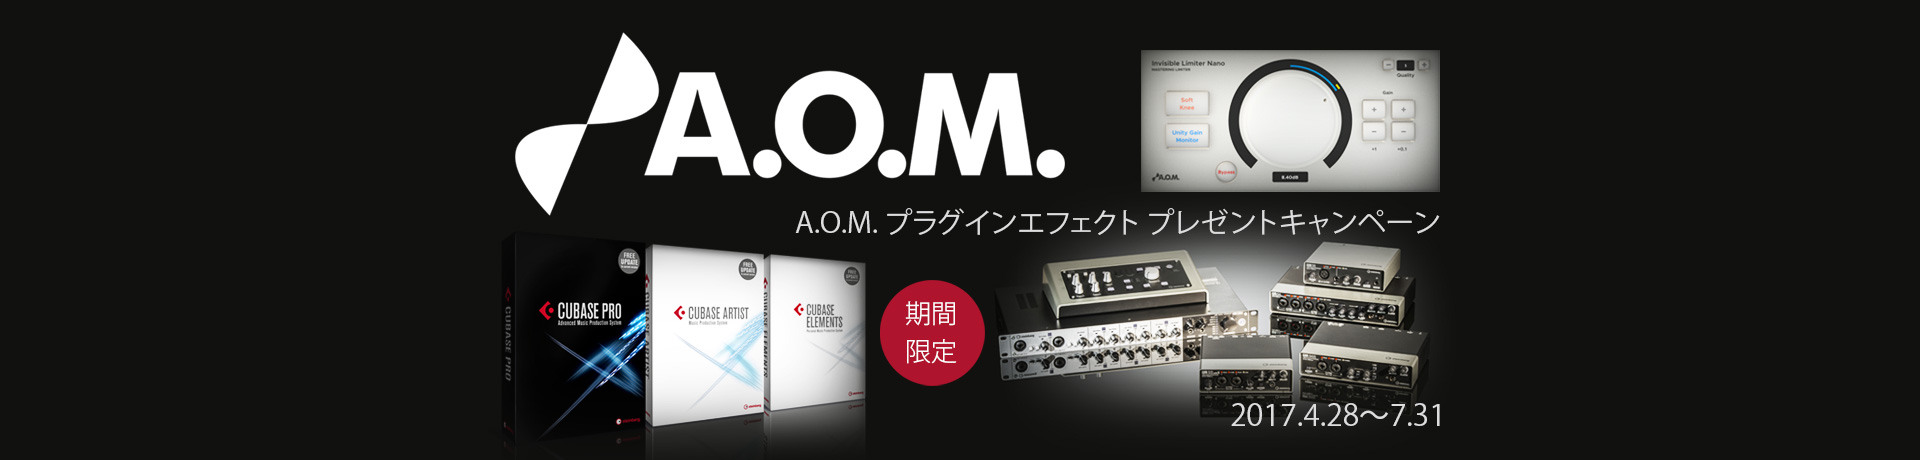 AOM-camp-banner